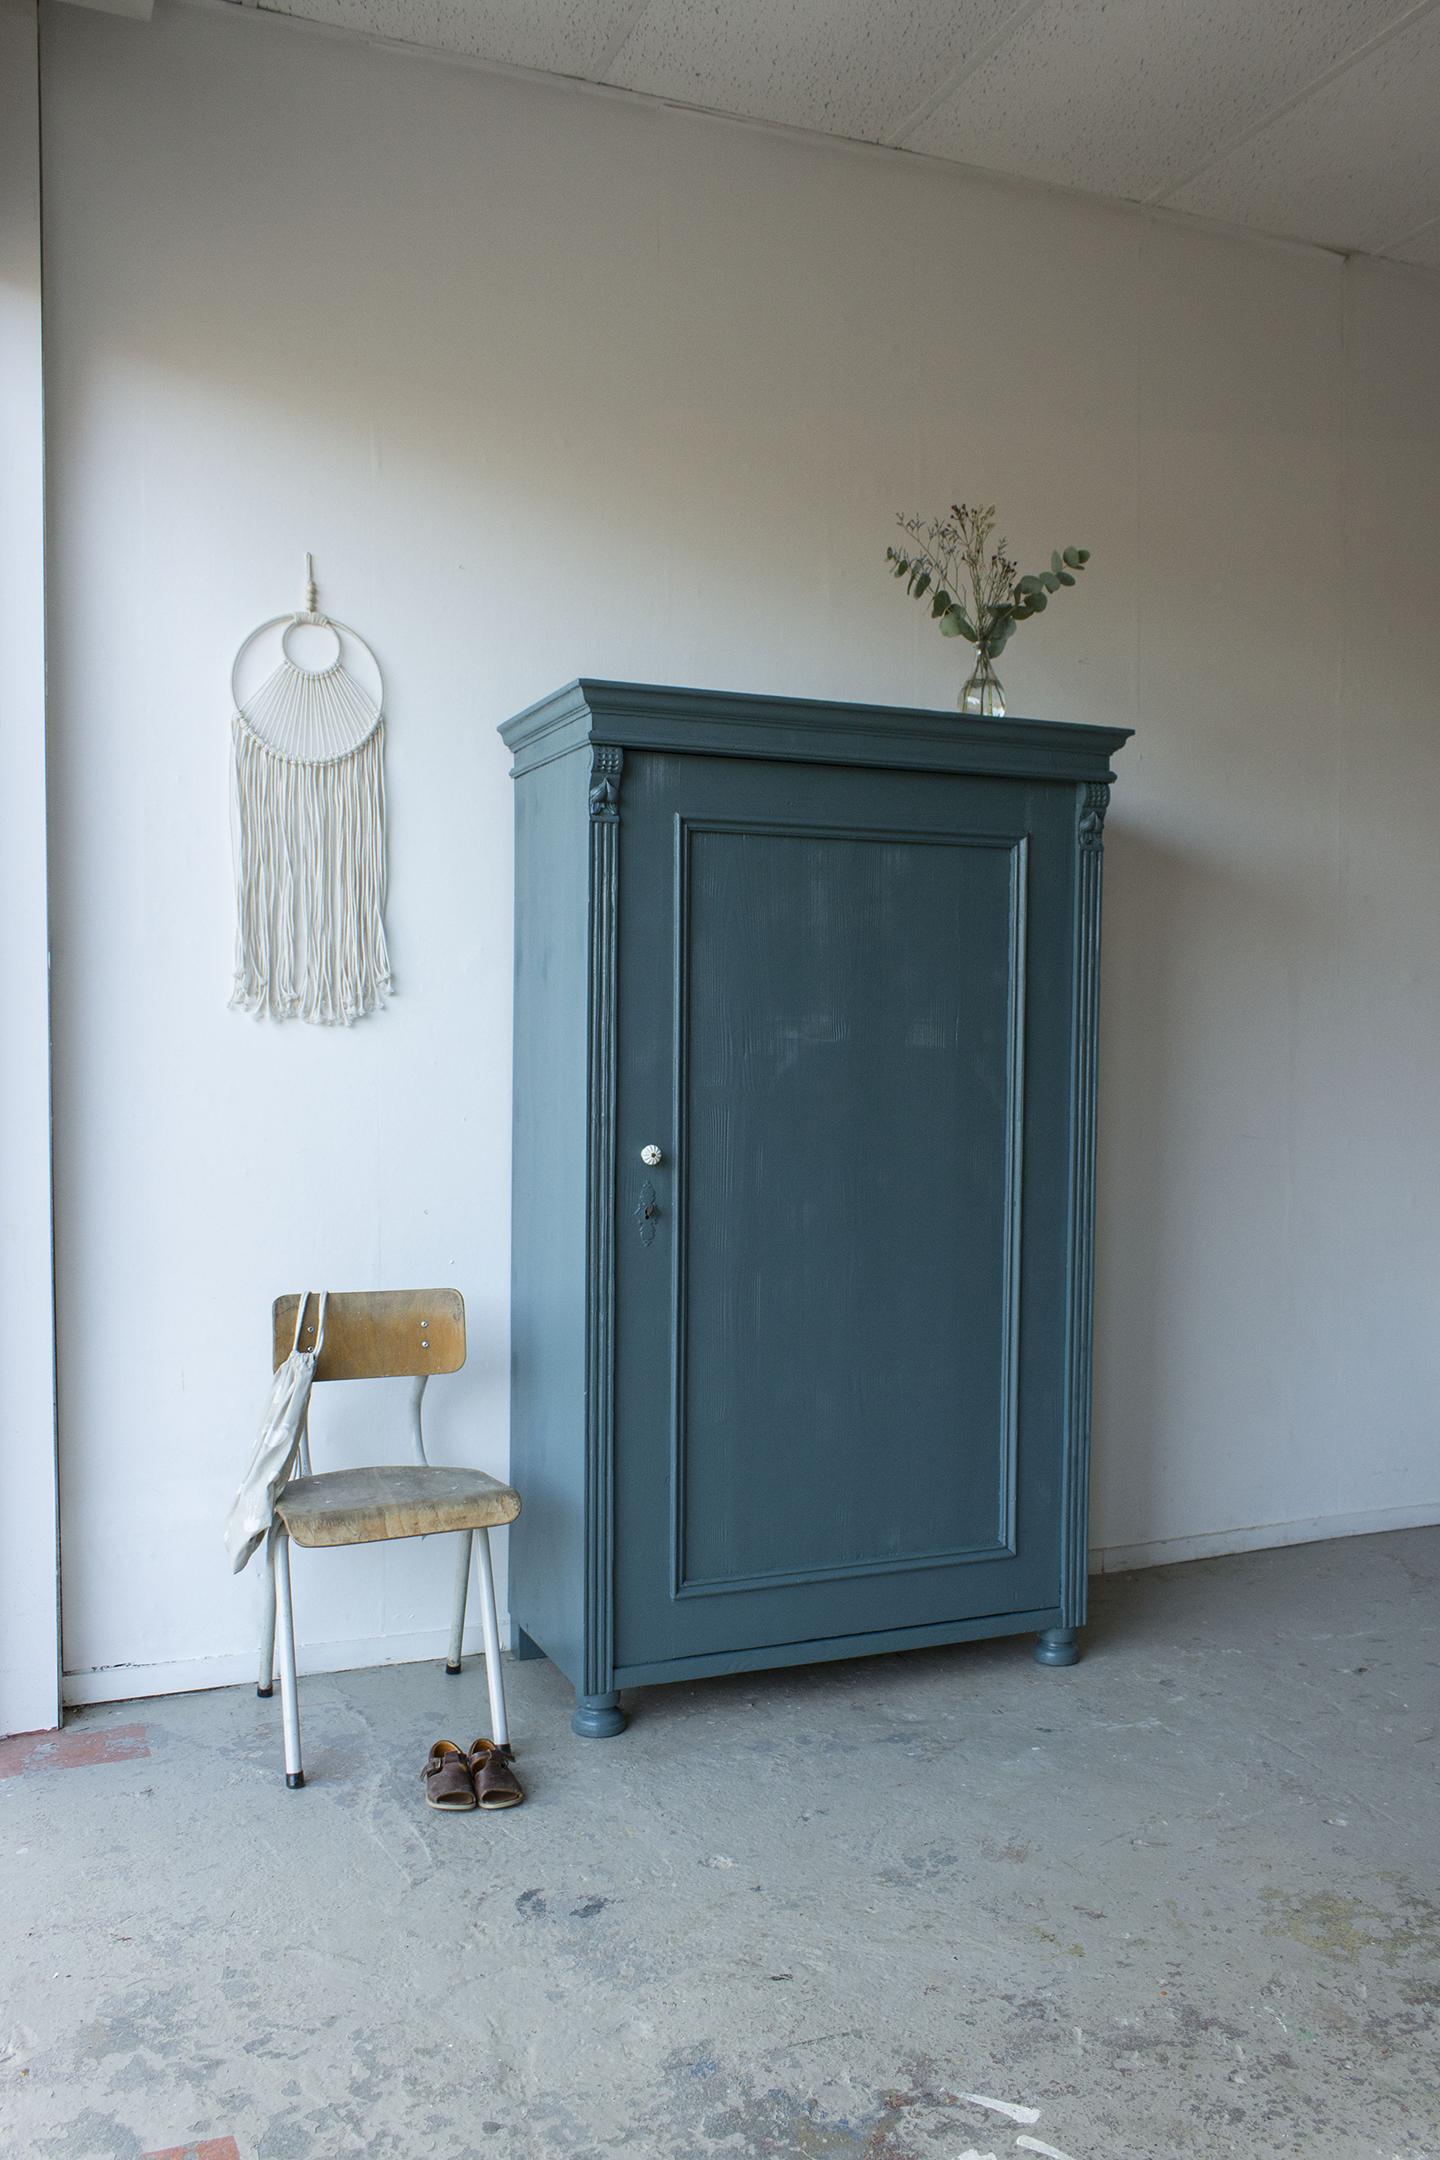 Sierlijke vintage kledingkast in Klif -  Firma zoethout.jpg